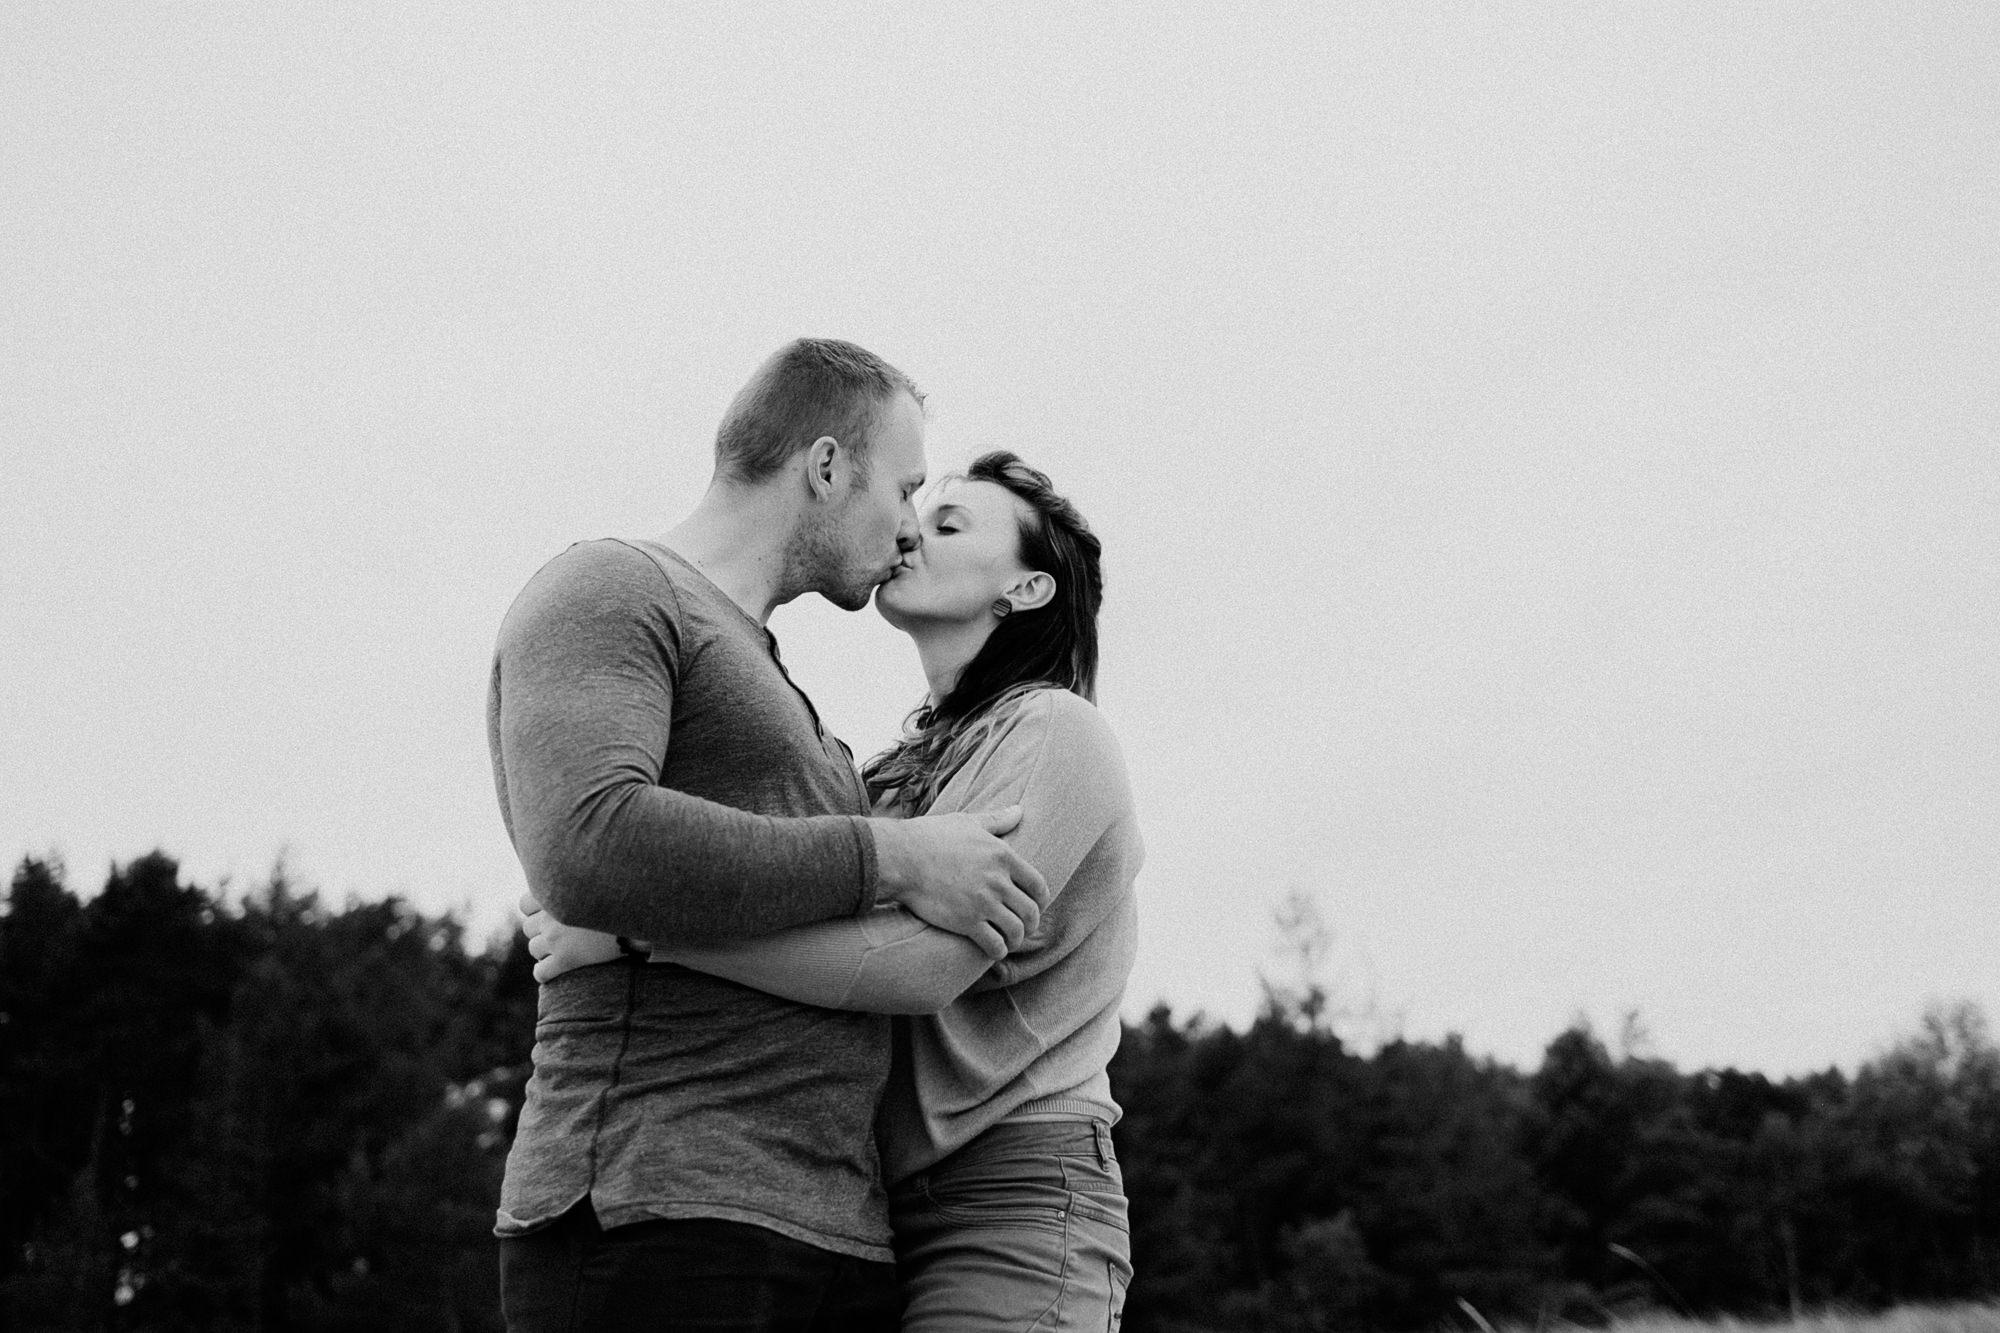 coupleshoot - baltic sea - Pärchen - verliebt - Fotoshooting - Ostsee